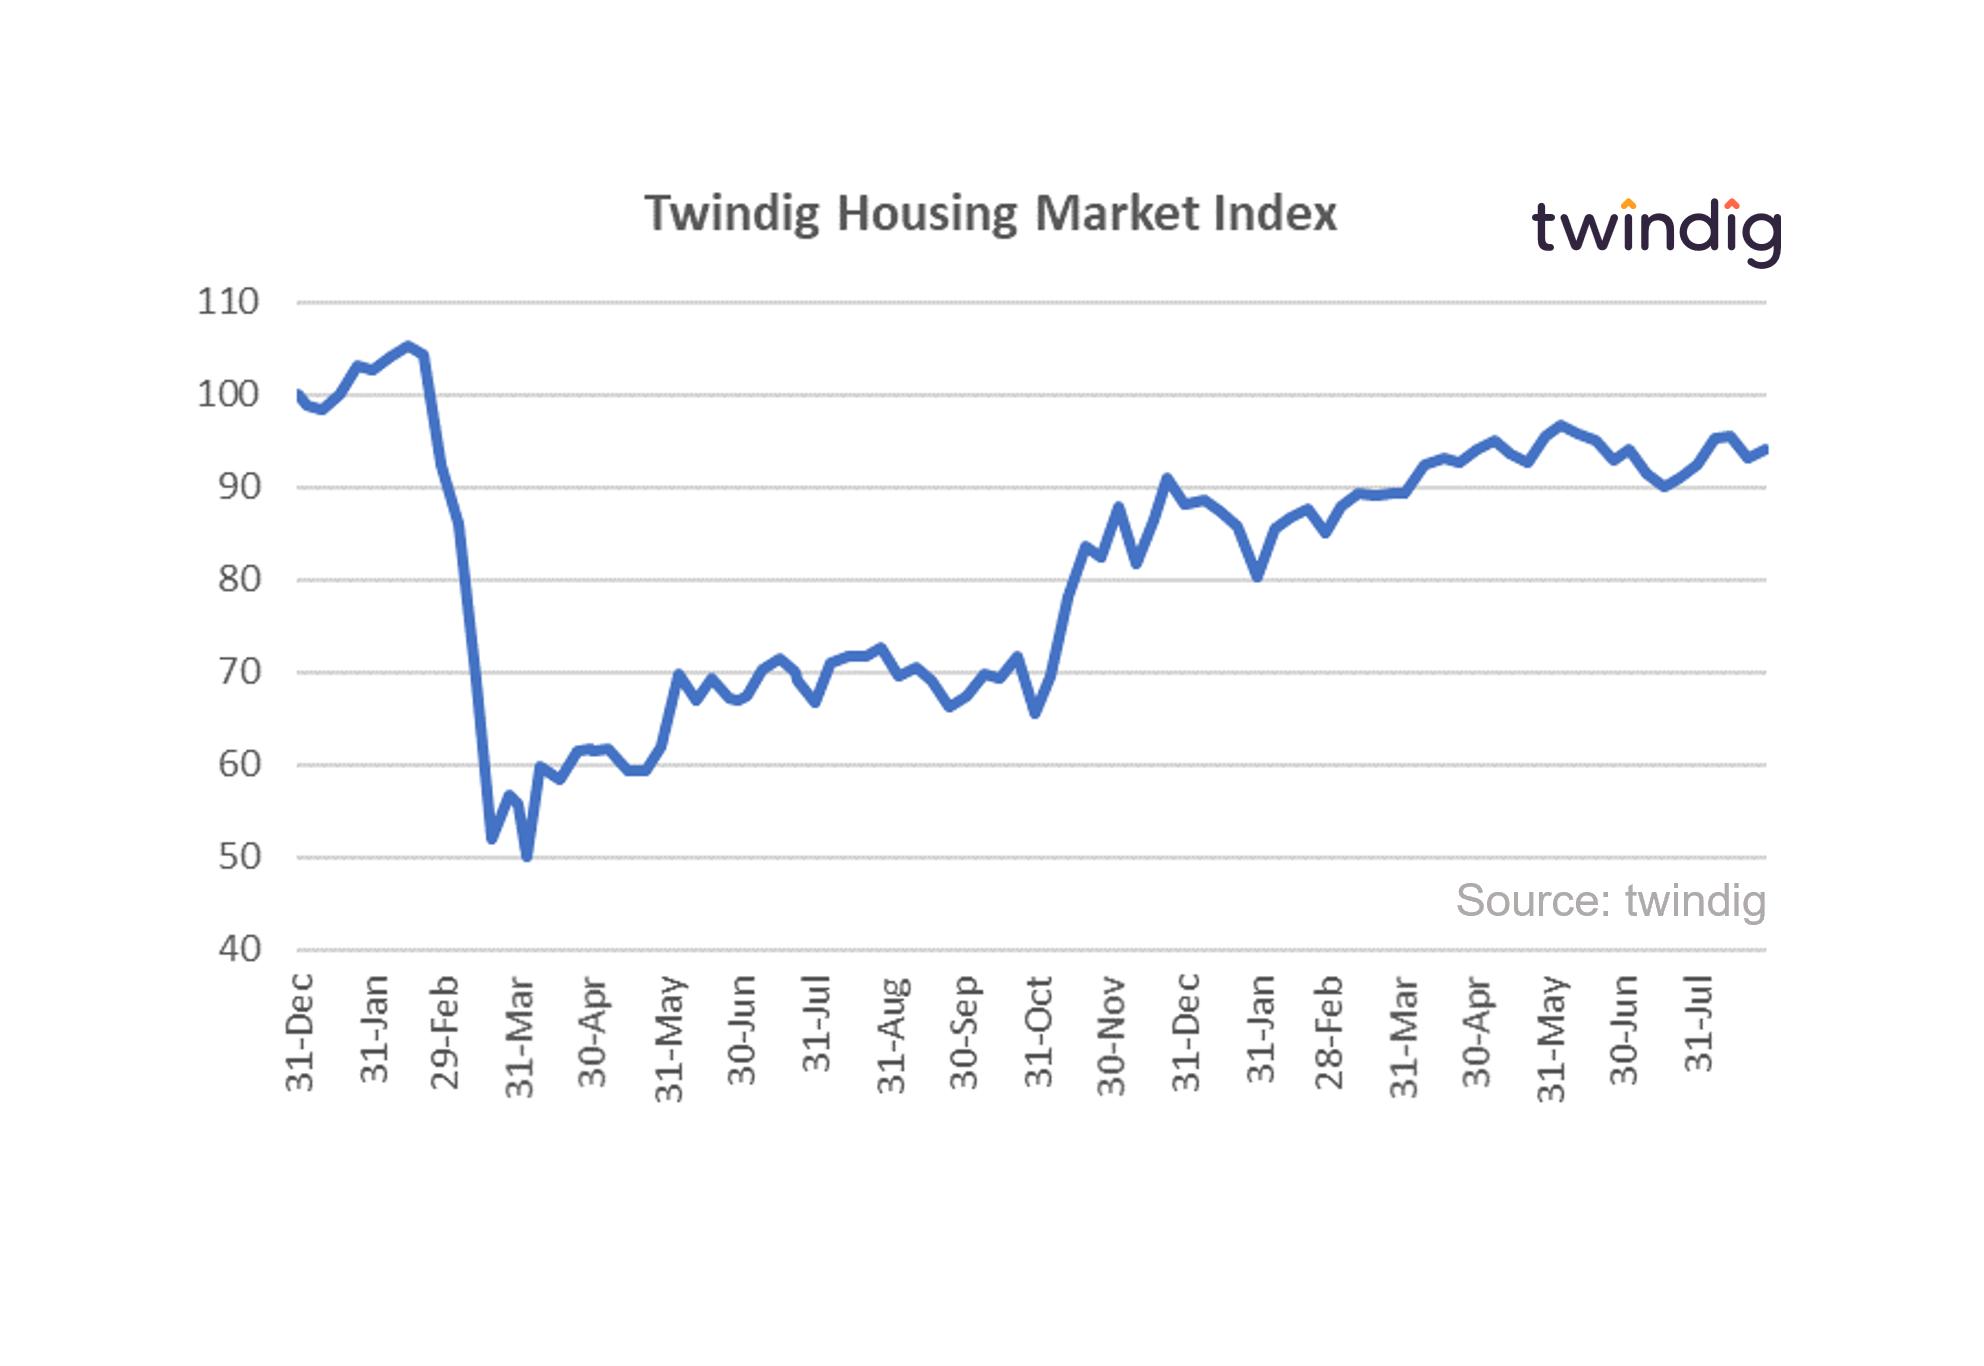 Housing market index chart graph 28 Aug 2021 twindig anthony codling